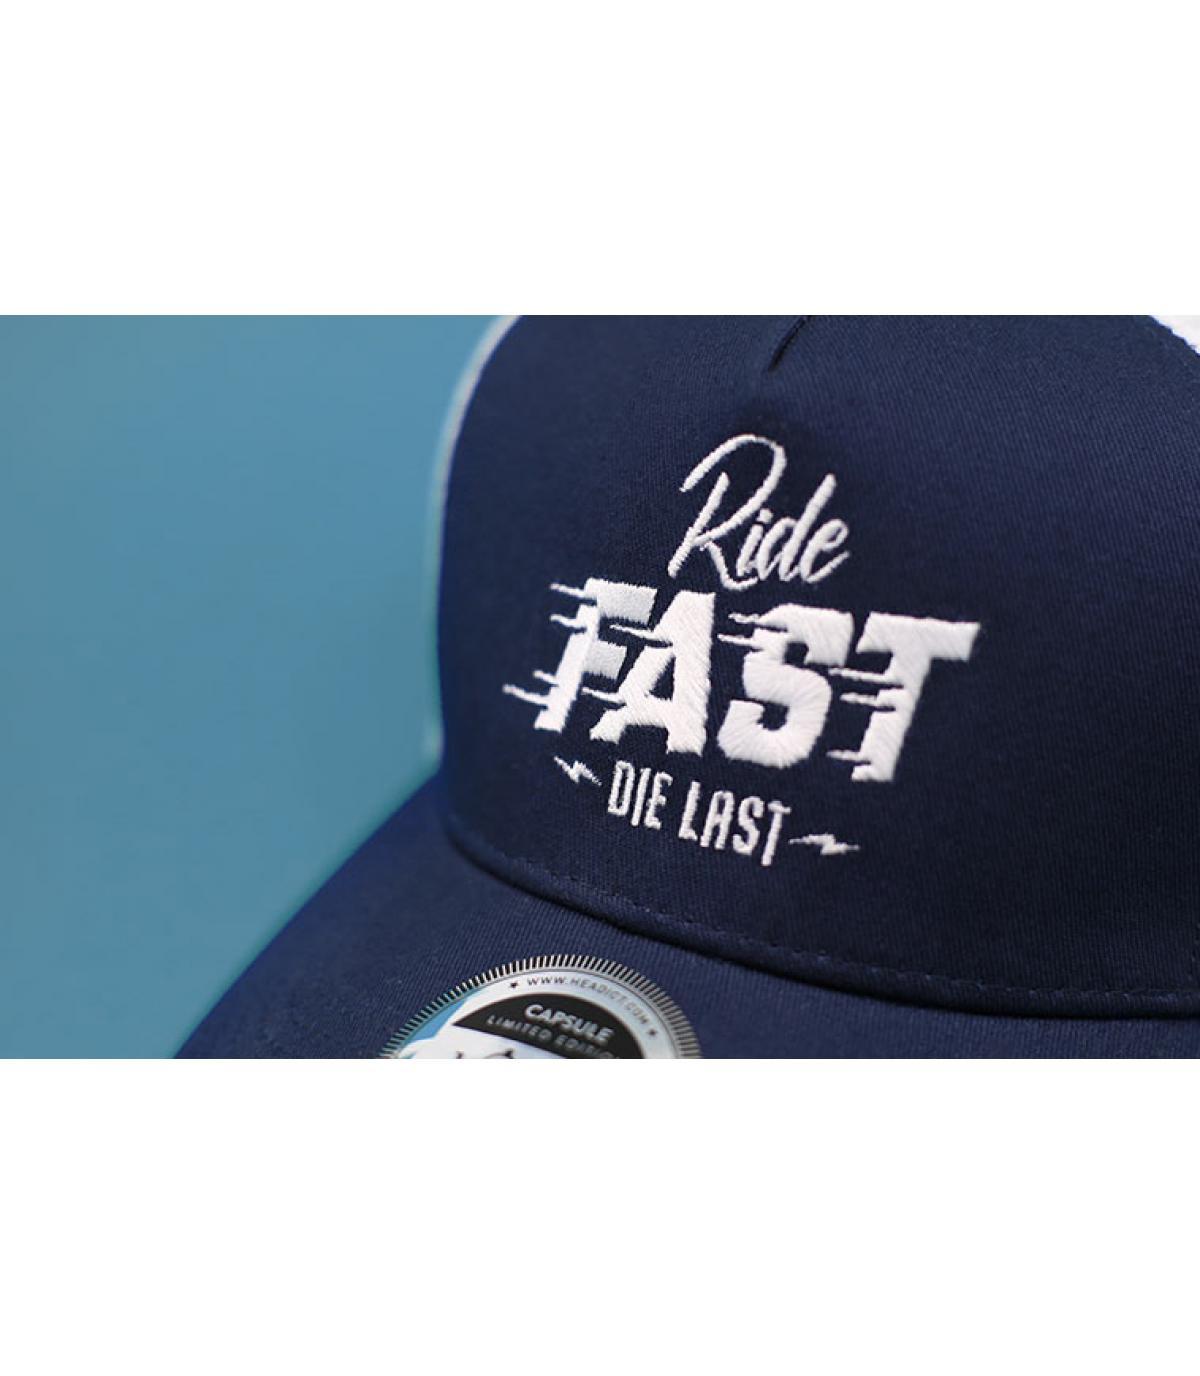 Details Trucker Ride Fast - Abbildung 5